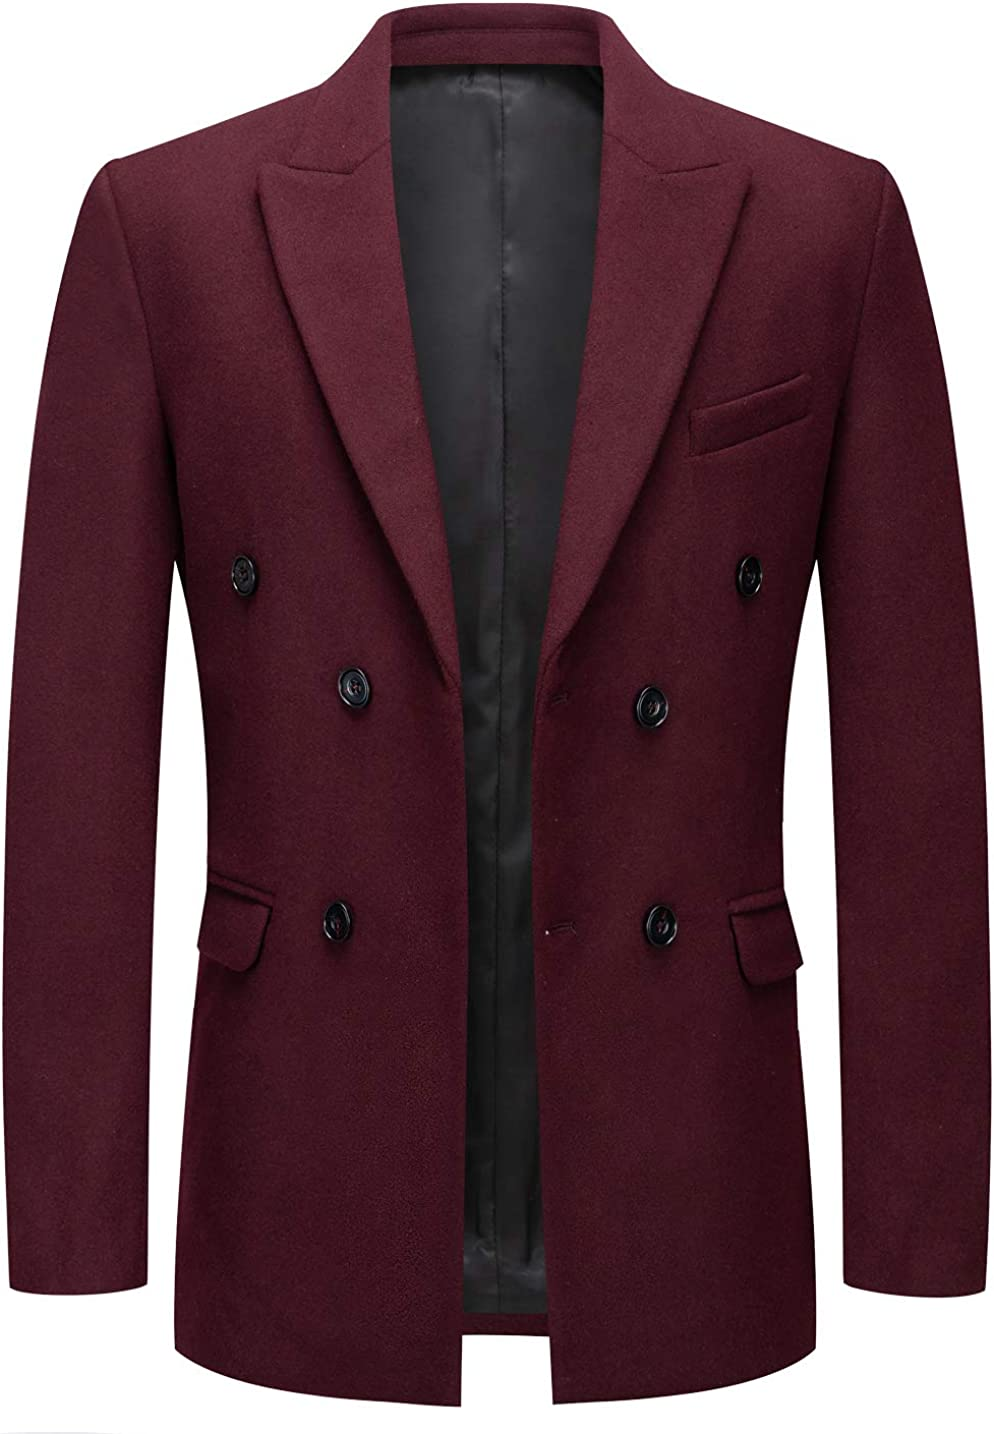 chouyatou Men's Classic Peaked Lapel unisex Collar Double Breasted Washington Mall Slim